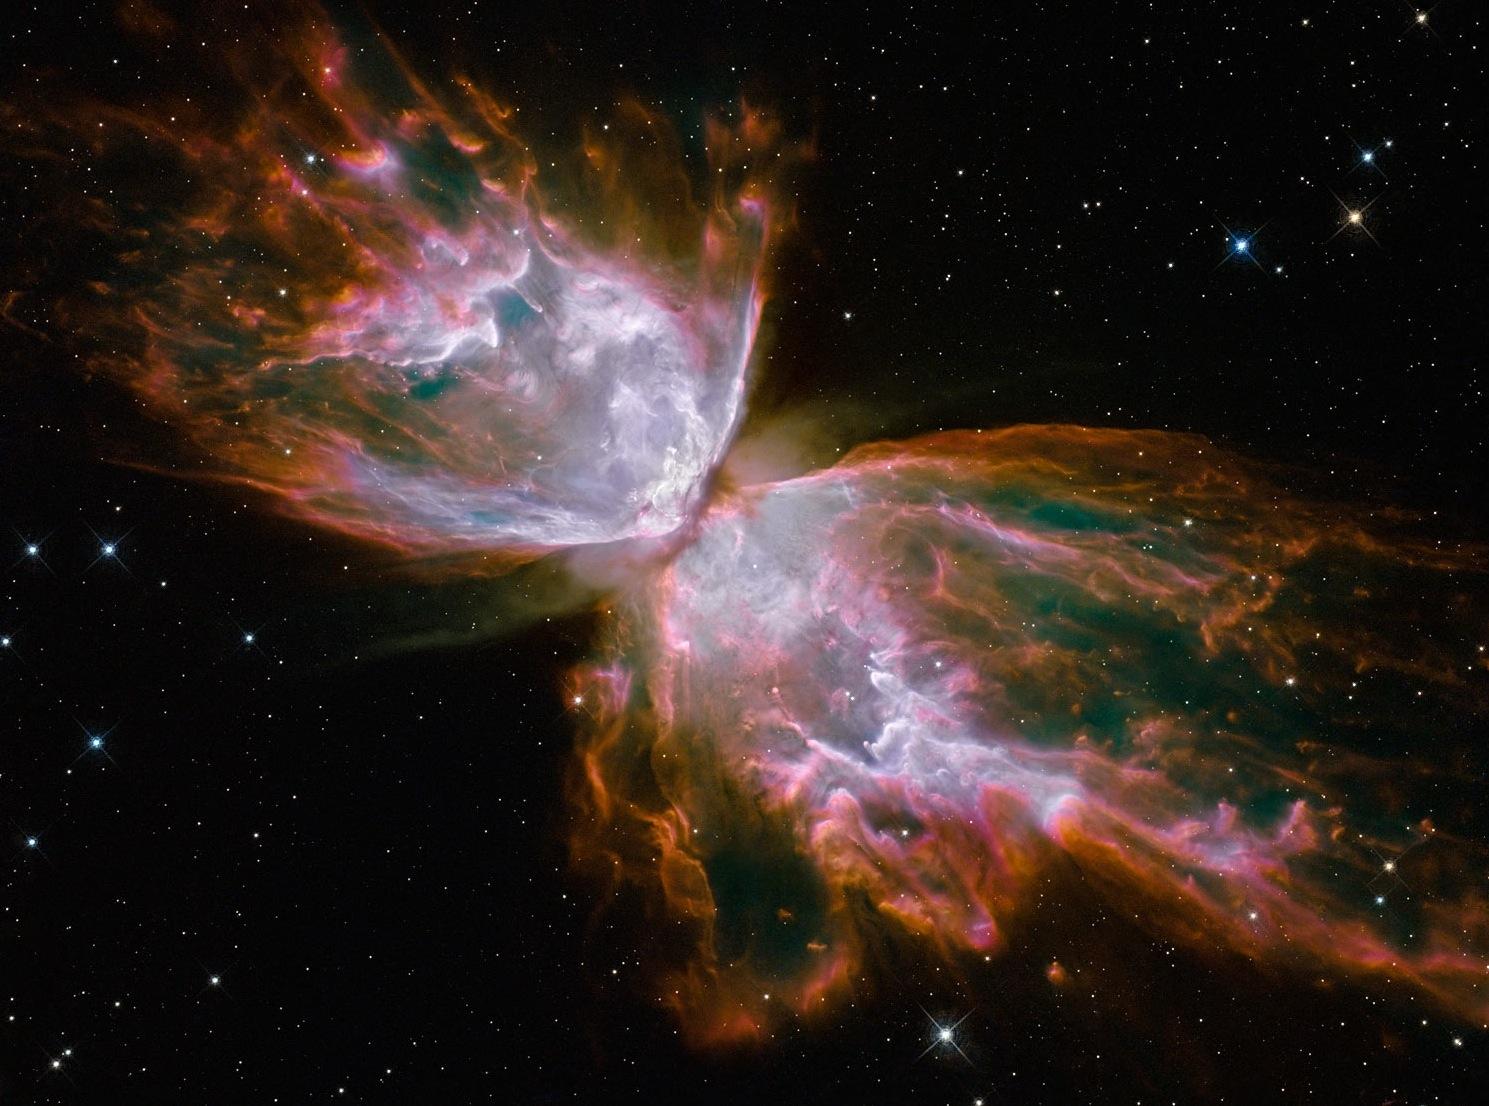 Death of A Star | NASA | Public Domain